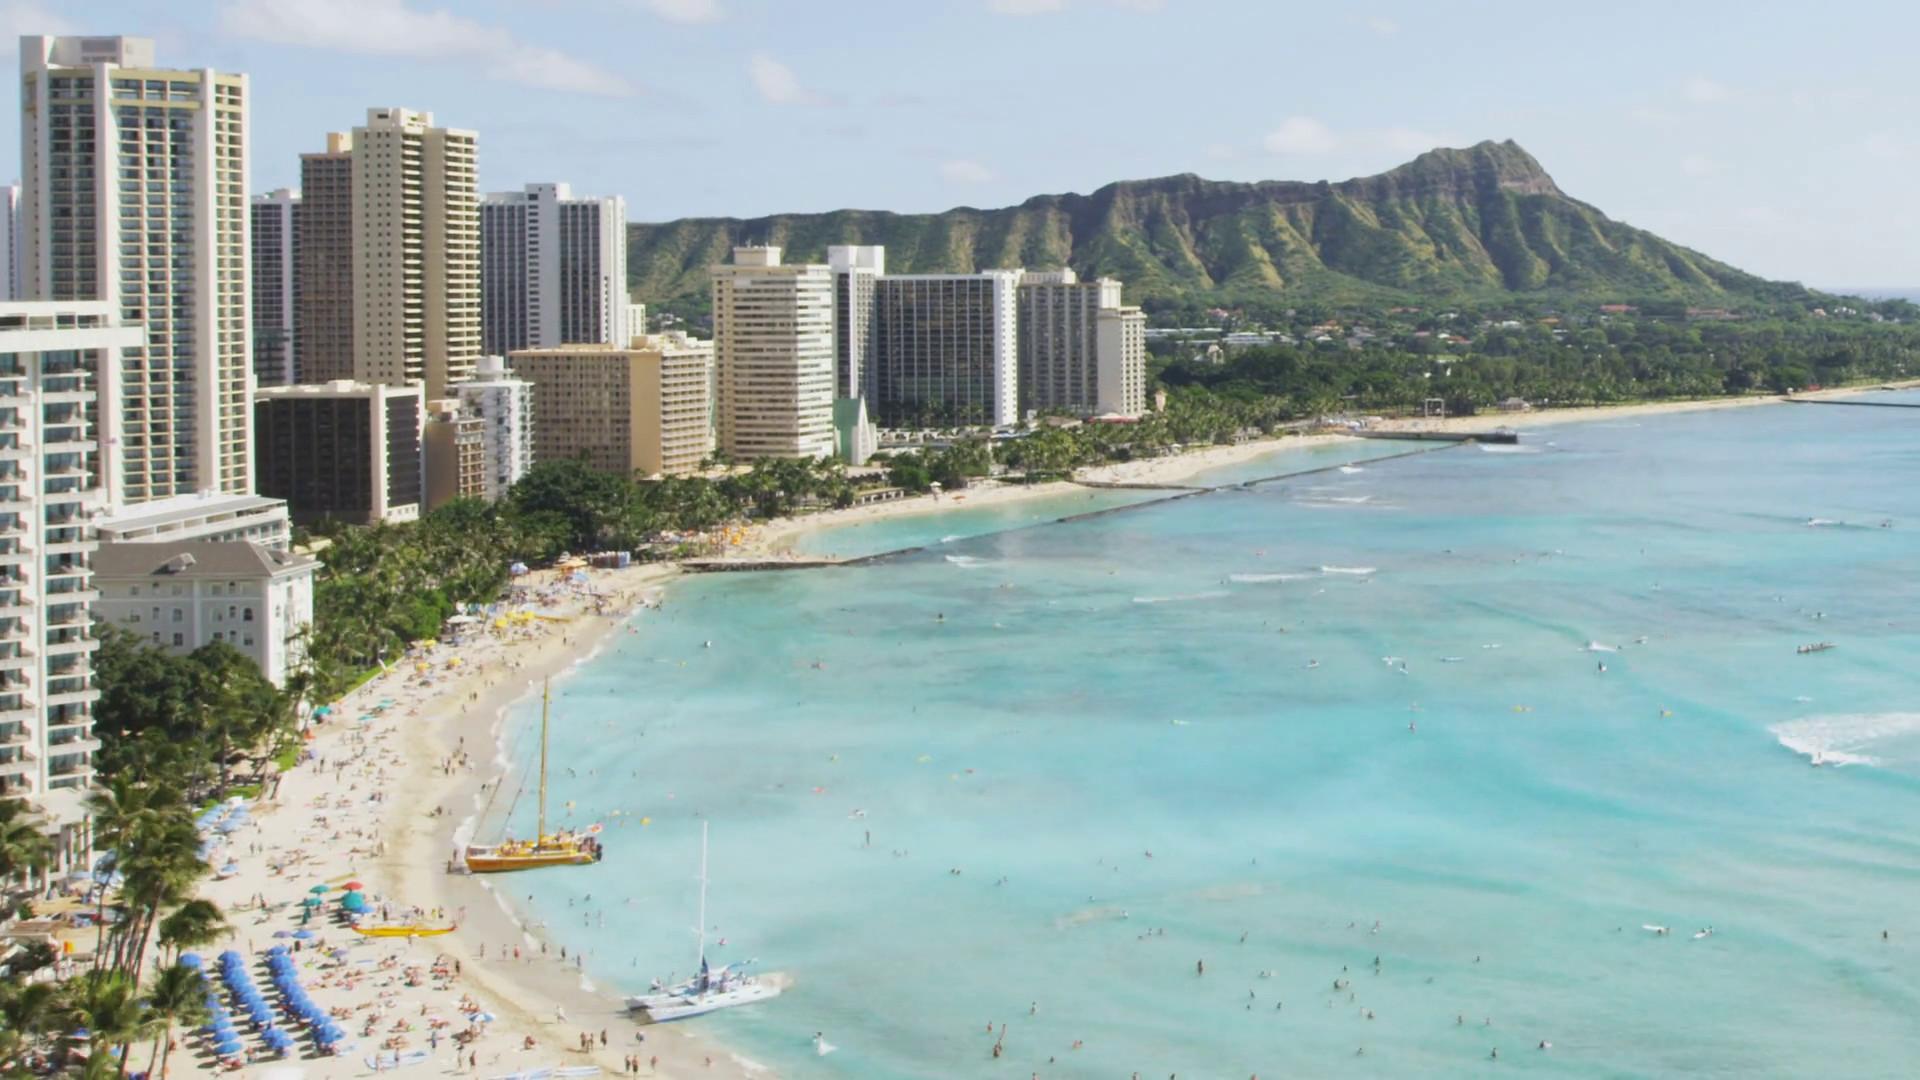 Res: 1920x1080, Waikiki beach in Honolulu on Oahu, Timelapse of the famous Diamond Head in  tropical Oahu, Hawaii, USA. Shot on RED EPIC. Stock Video Footage -  Videoblocks